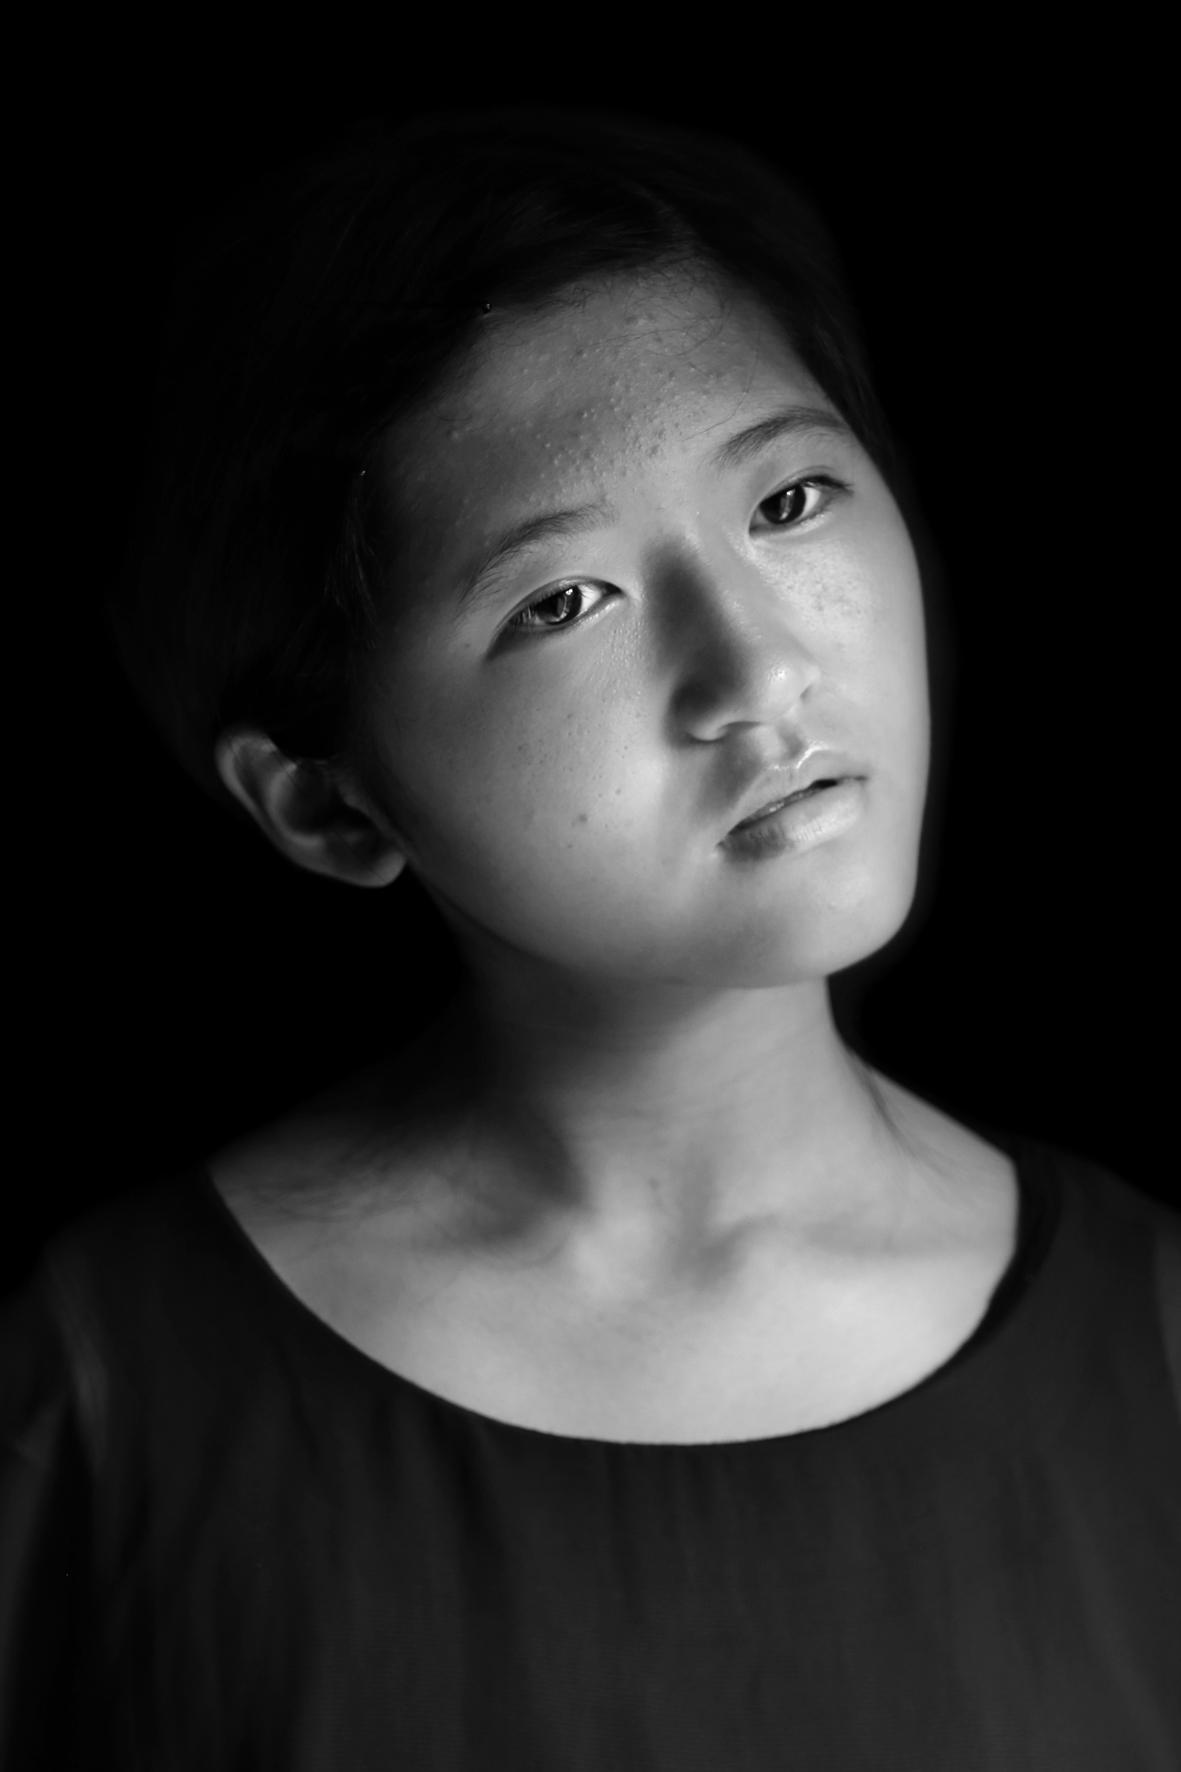 《My Portrait #023》